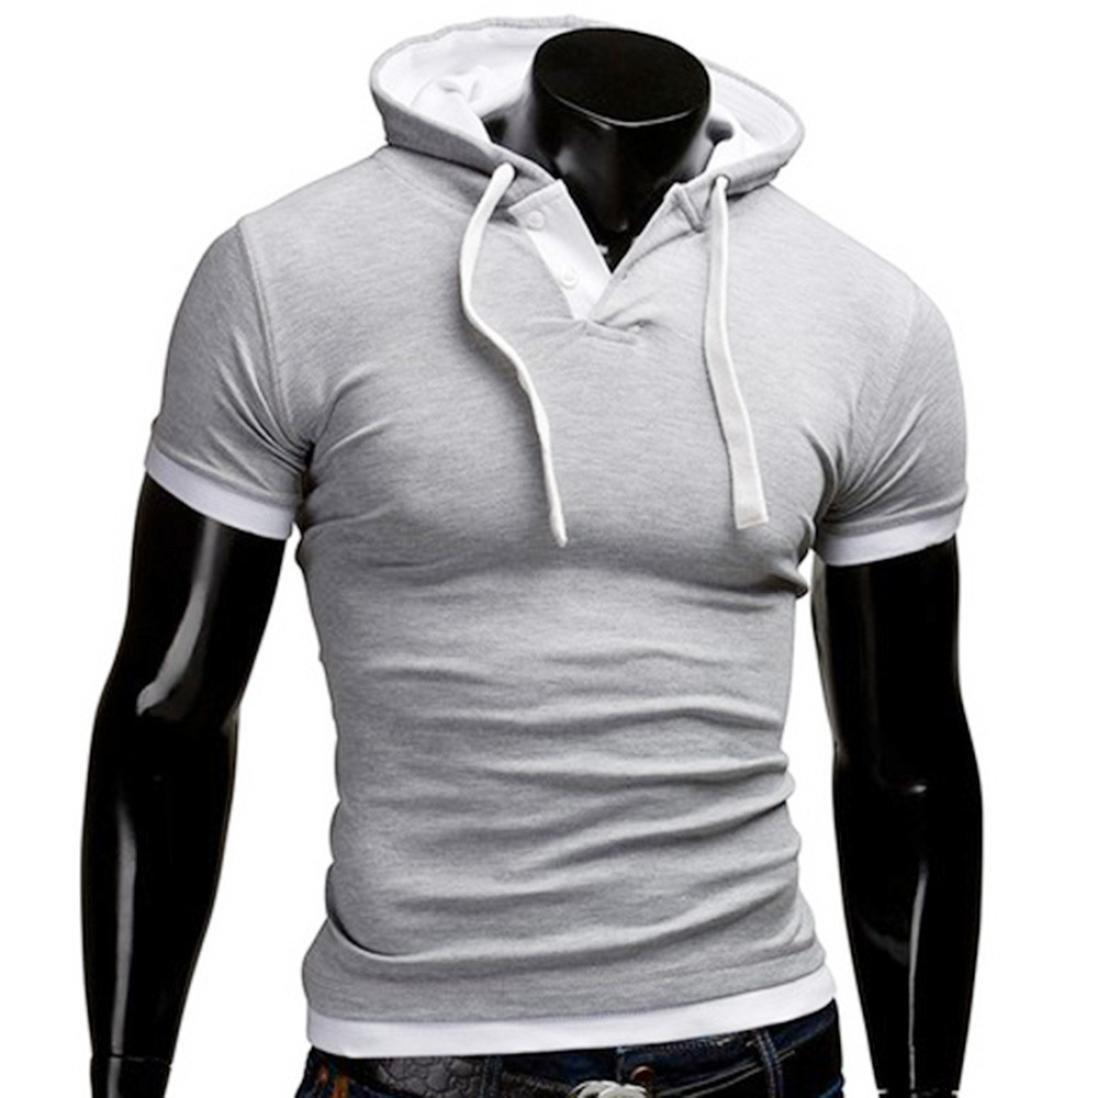 Coper Summer Fashion Mens Casual Hooded Pullover Short-Sleeved T-Shirt XL, Blue